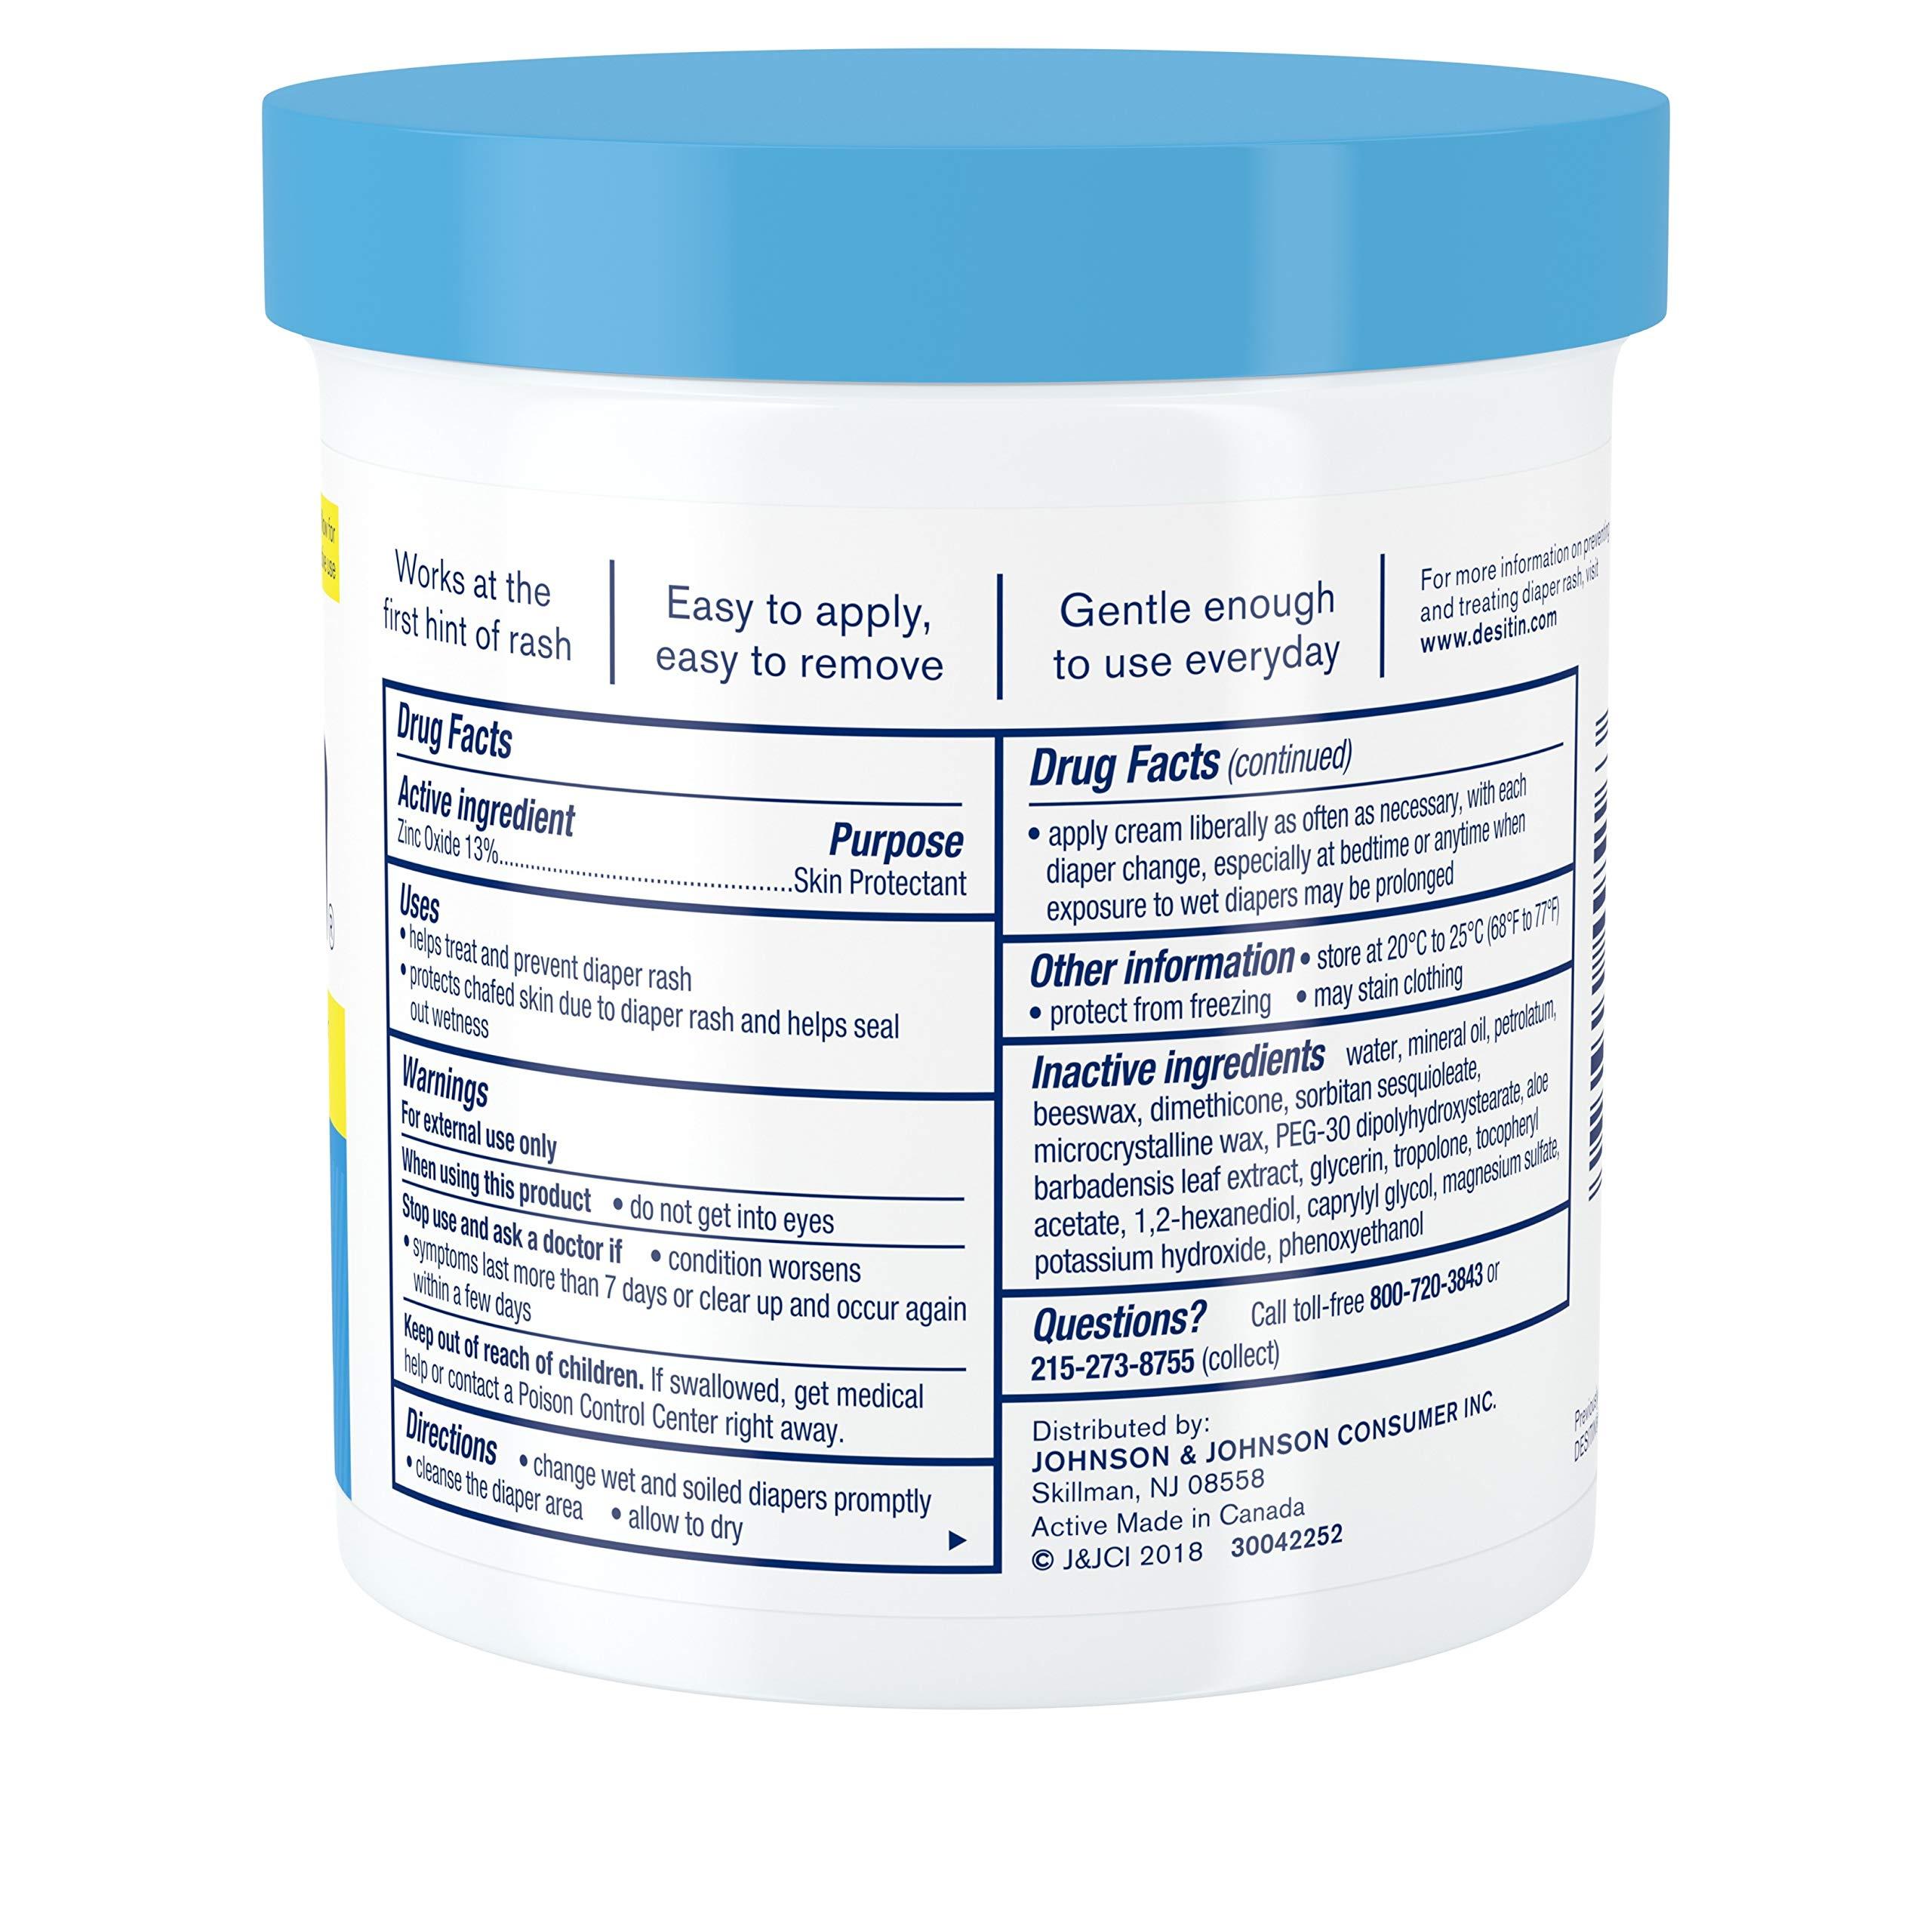 Desitin Daily Defense Baby Diaper Rash Cream with Zinc Oxide to Treat, Relieve & Prevent diaper rash, 16 oz by Desitin (Image #9)